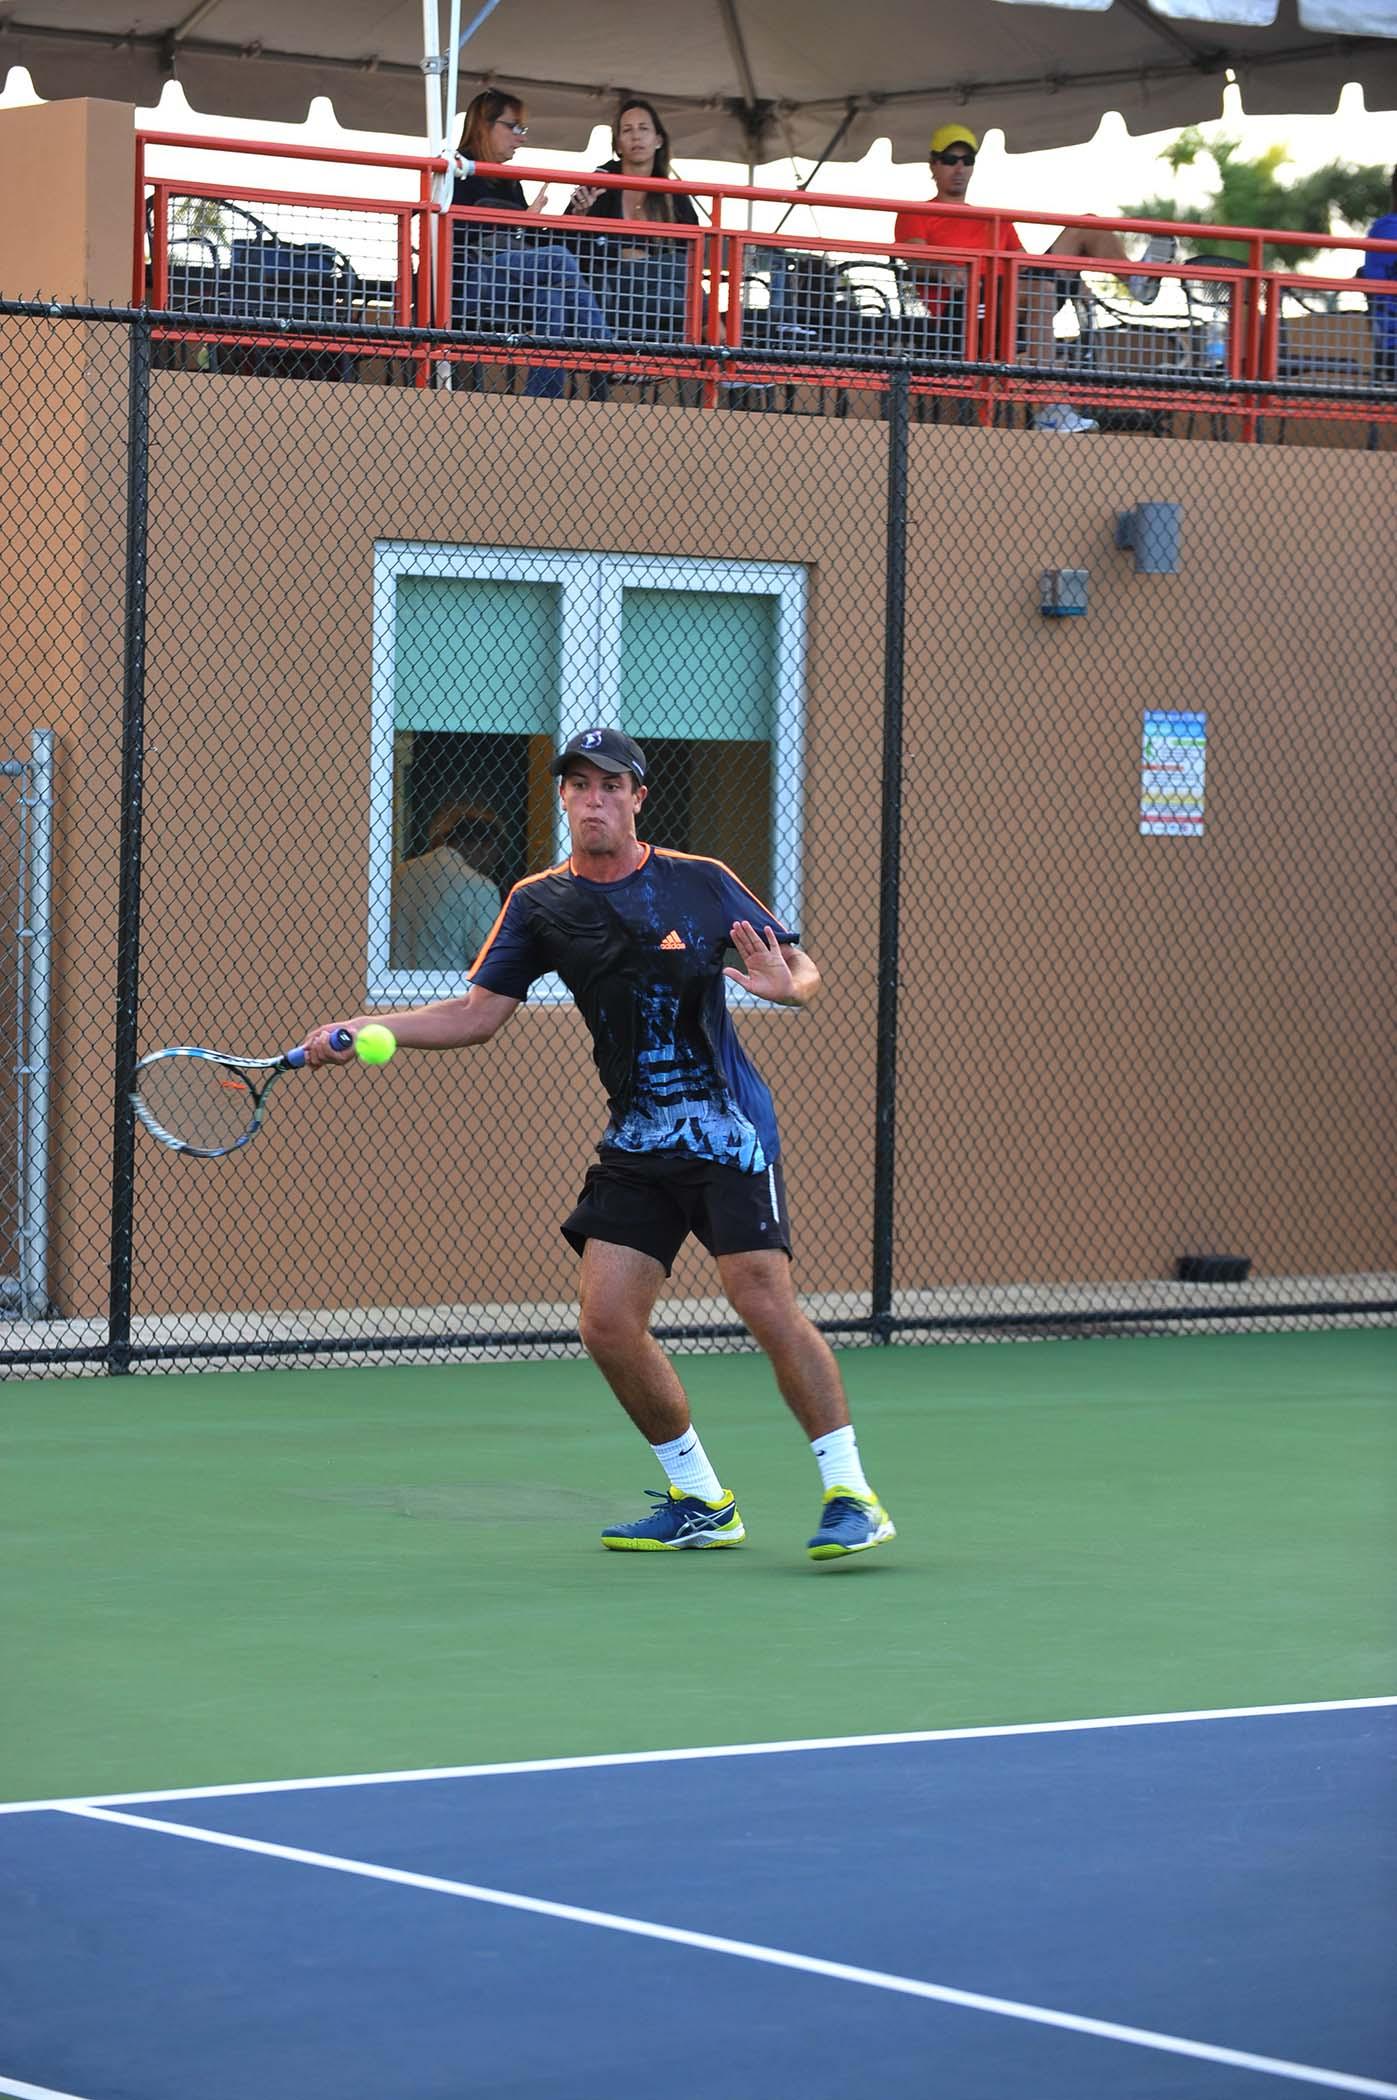 Participantes Tenis Juvenil-2-24-2018-19.jpg